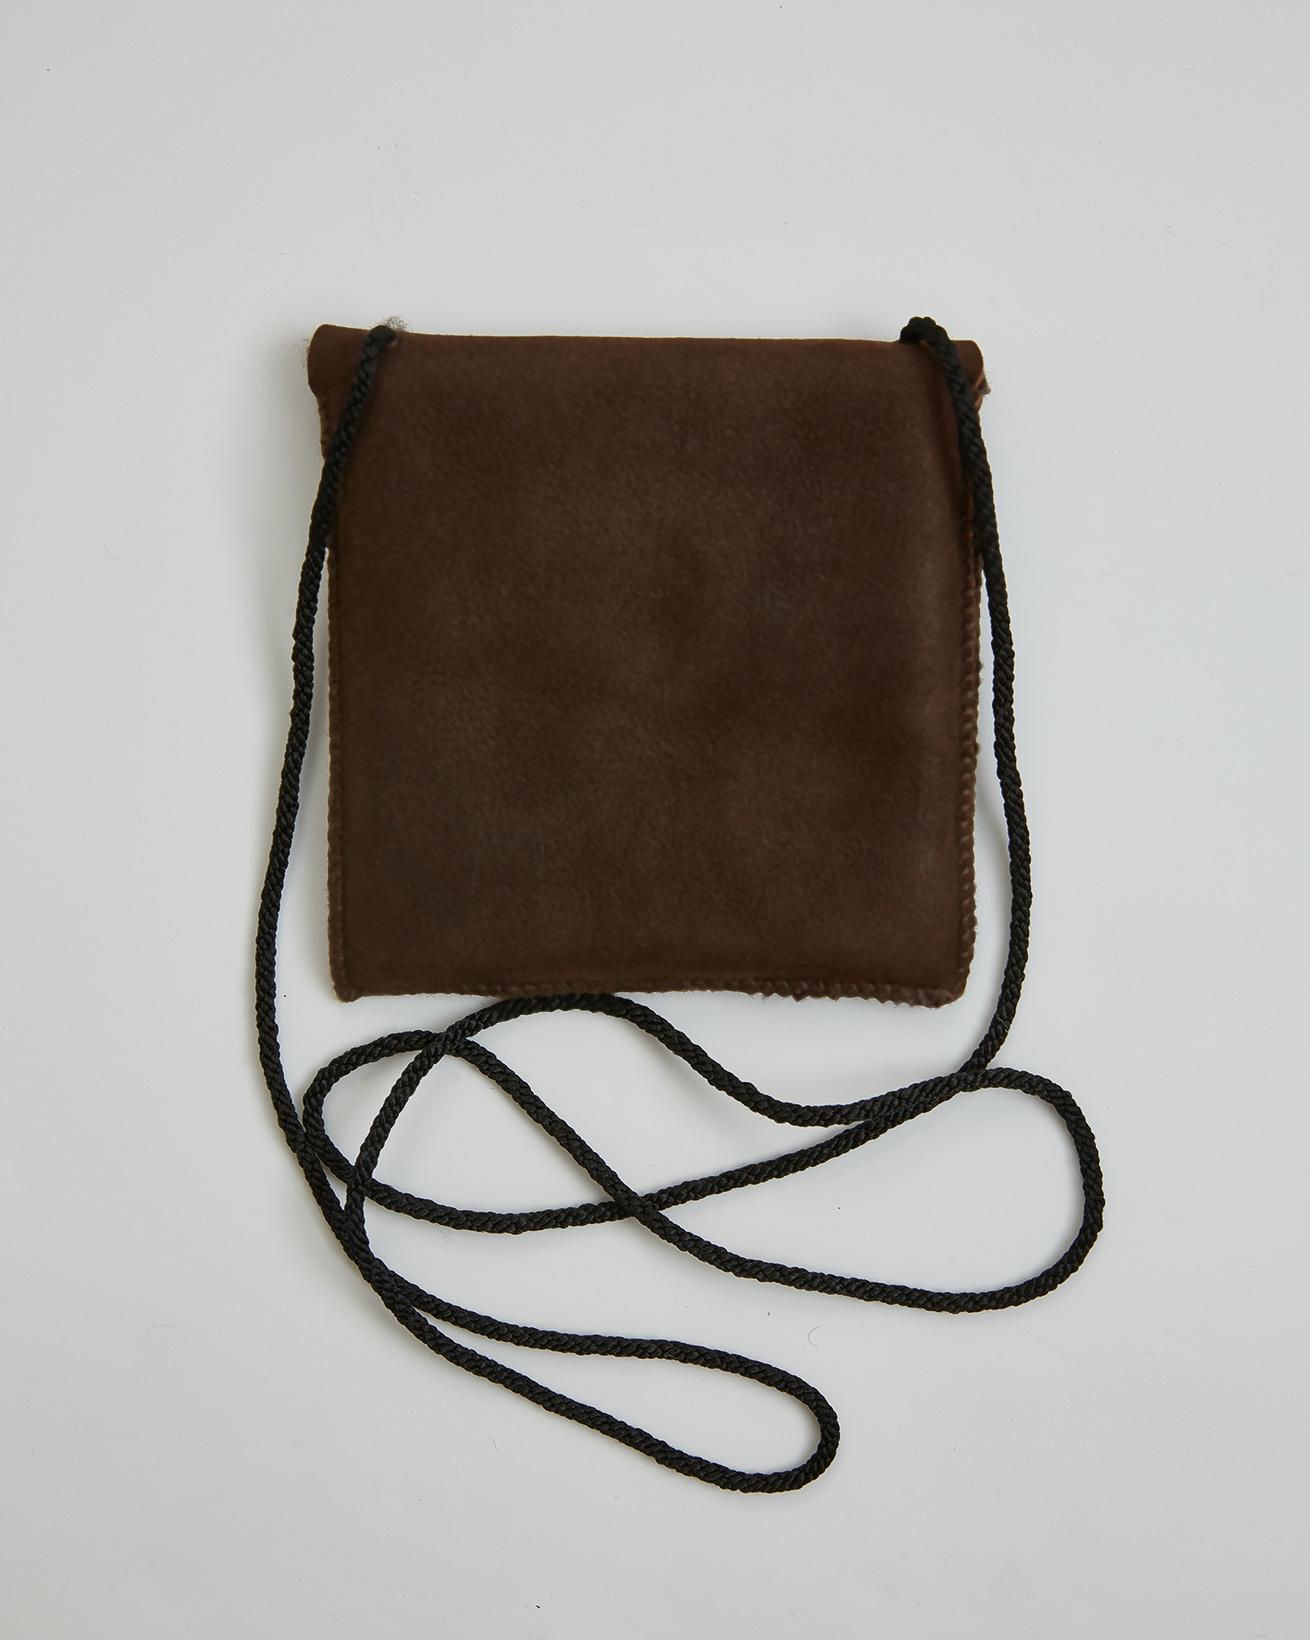 2774-sheepskin purse - brown - one size - back.jpg